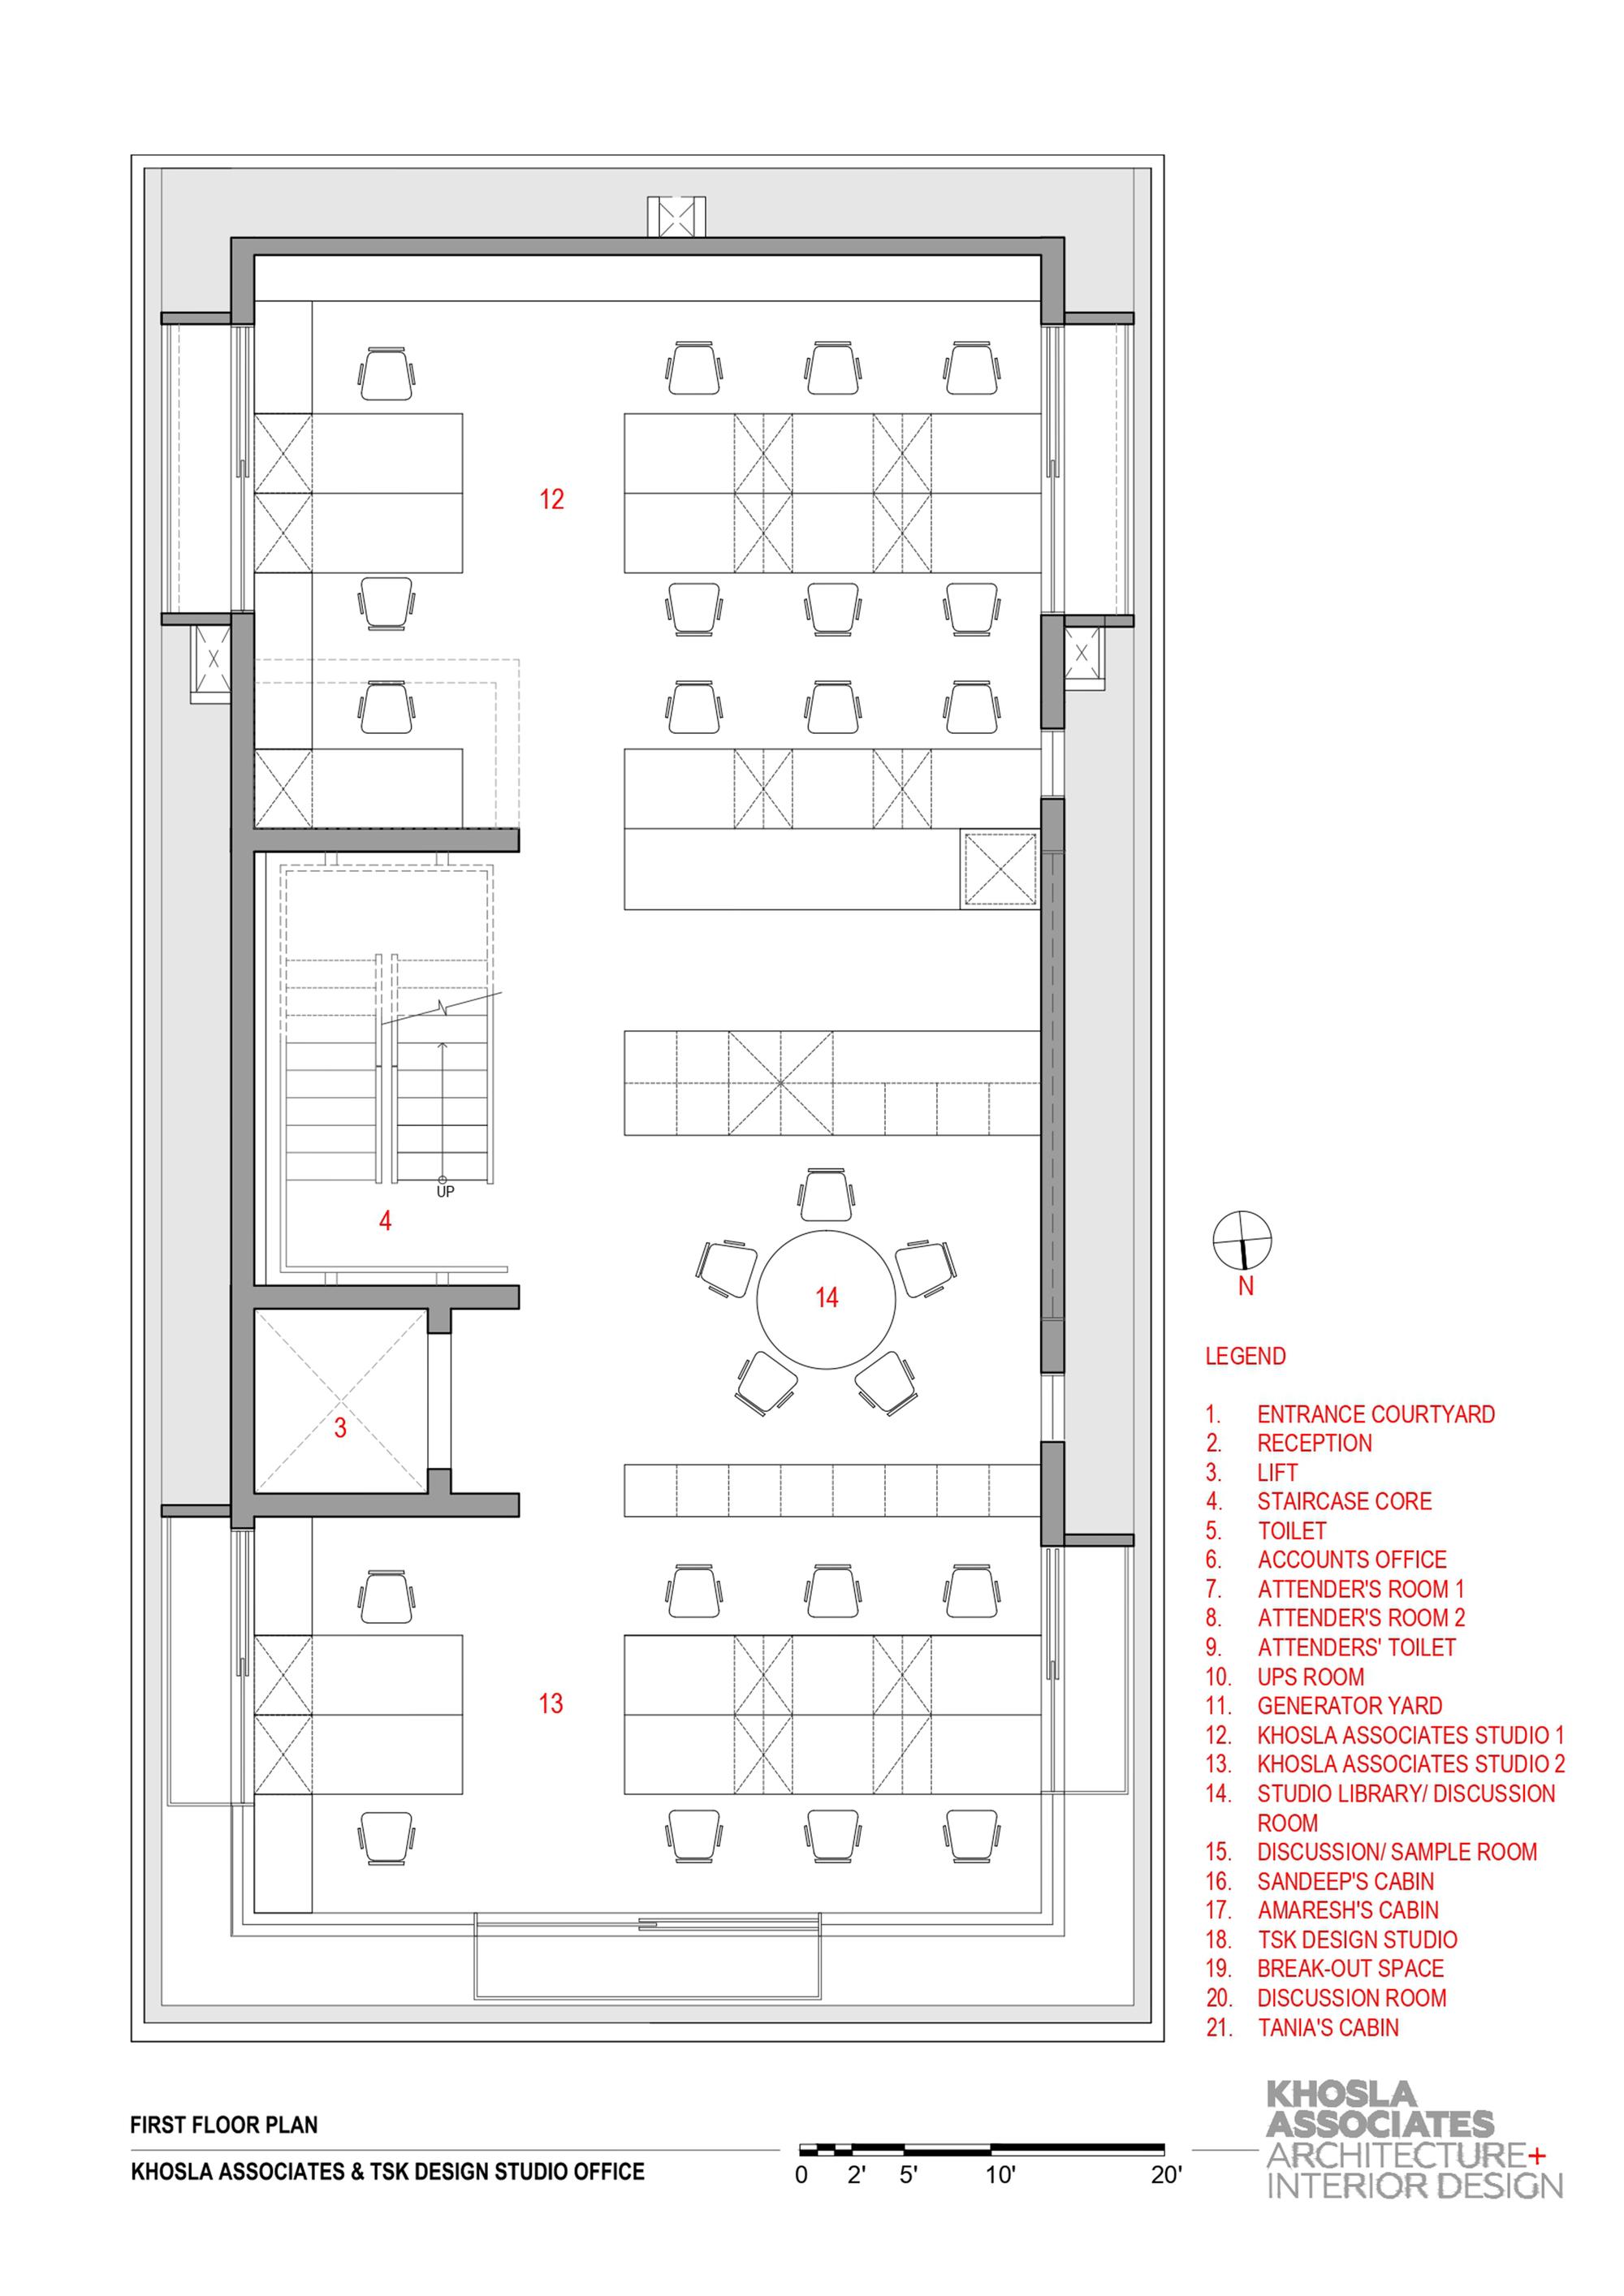 Gallery Of Khosla Associates And Tsk Design Studio Khosla